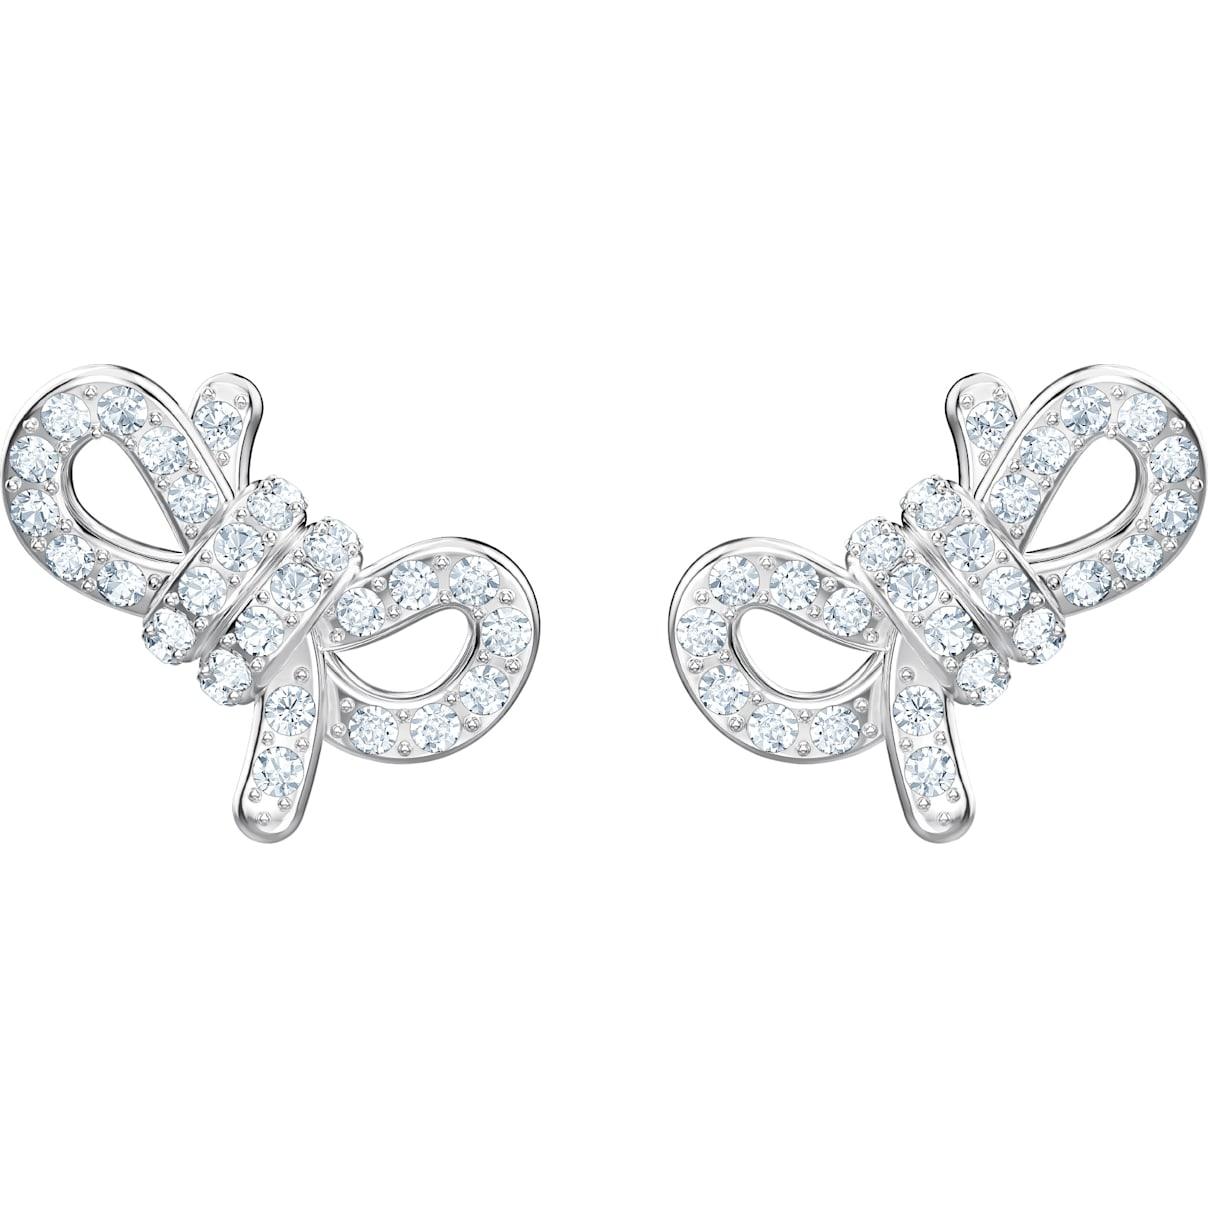 Swarovski Lifelong Bow Pierced Earrings, White, Rhodium plated